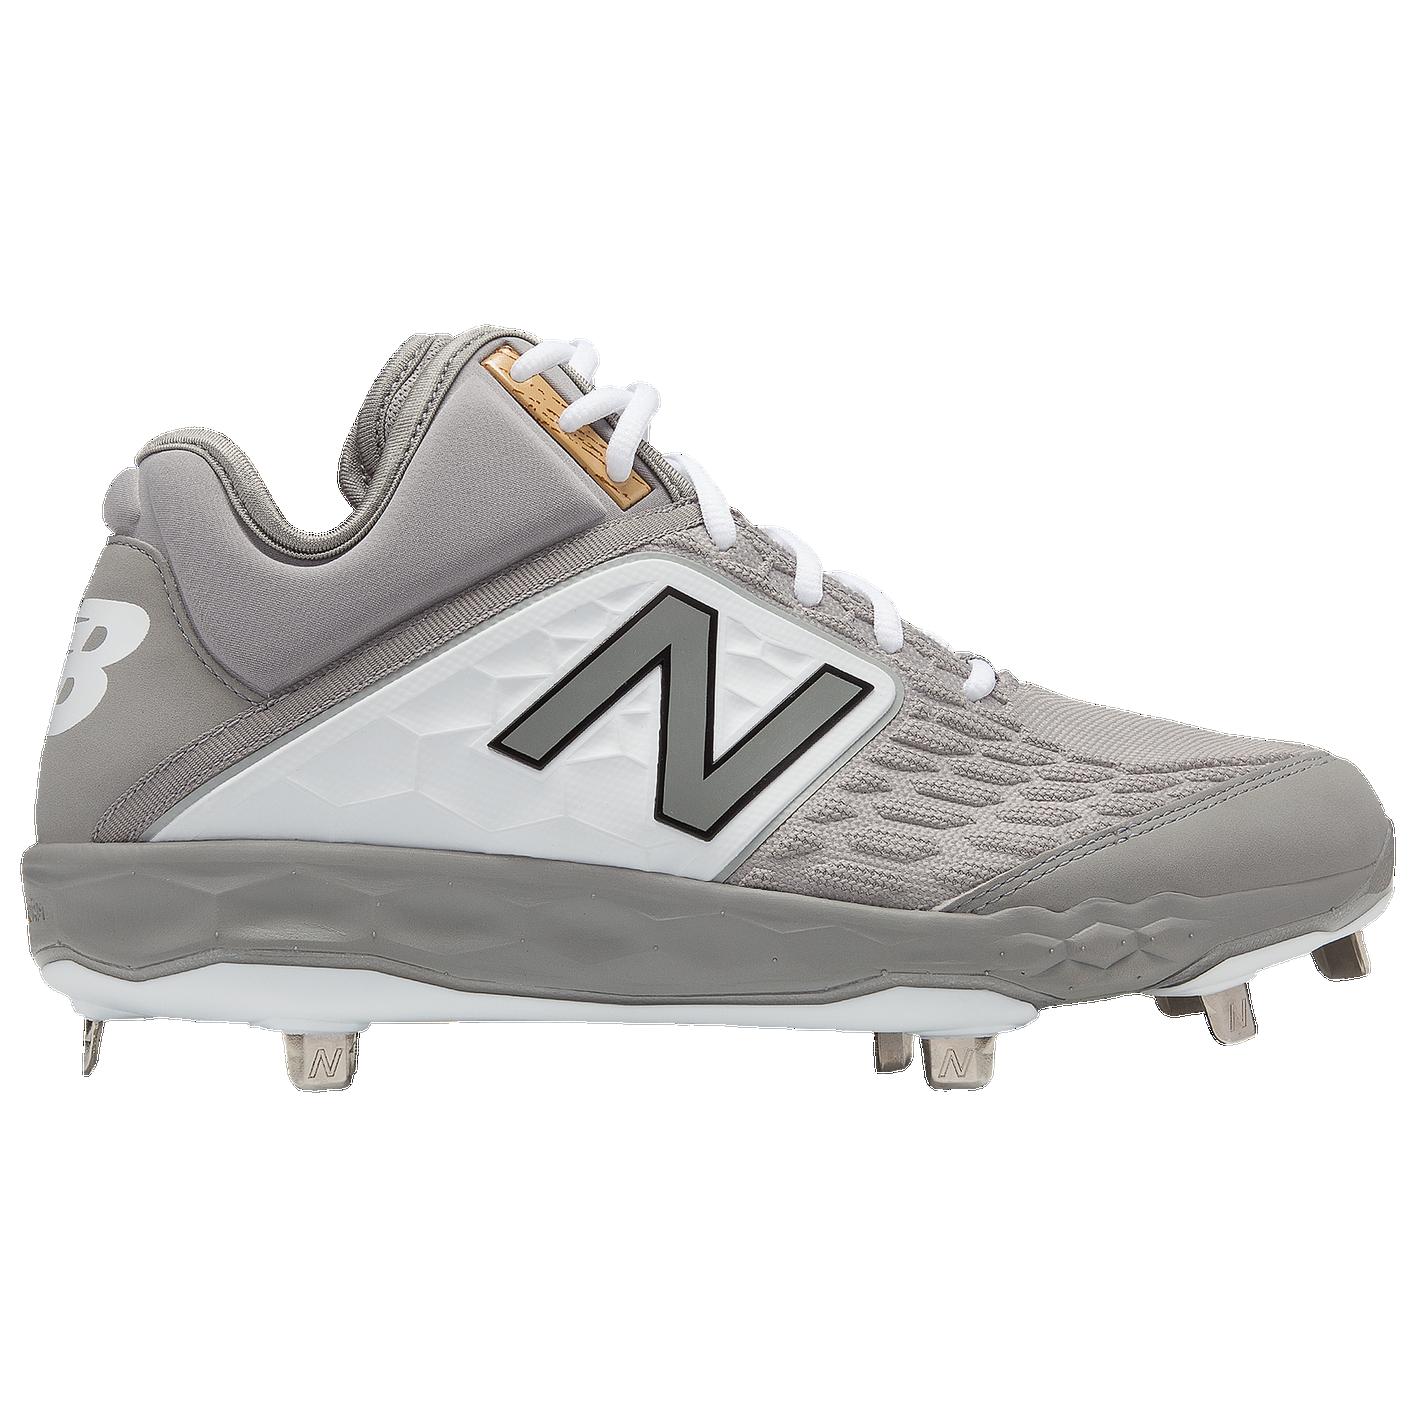 b9d51efe504 New Balance 3000v4 Metal Mid - Men s - Baseball - Shoes - Grey White